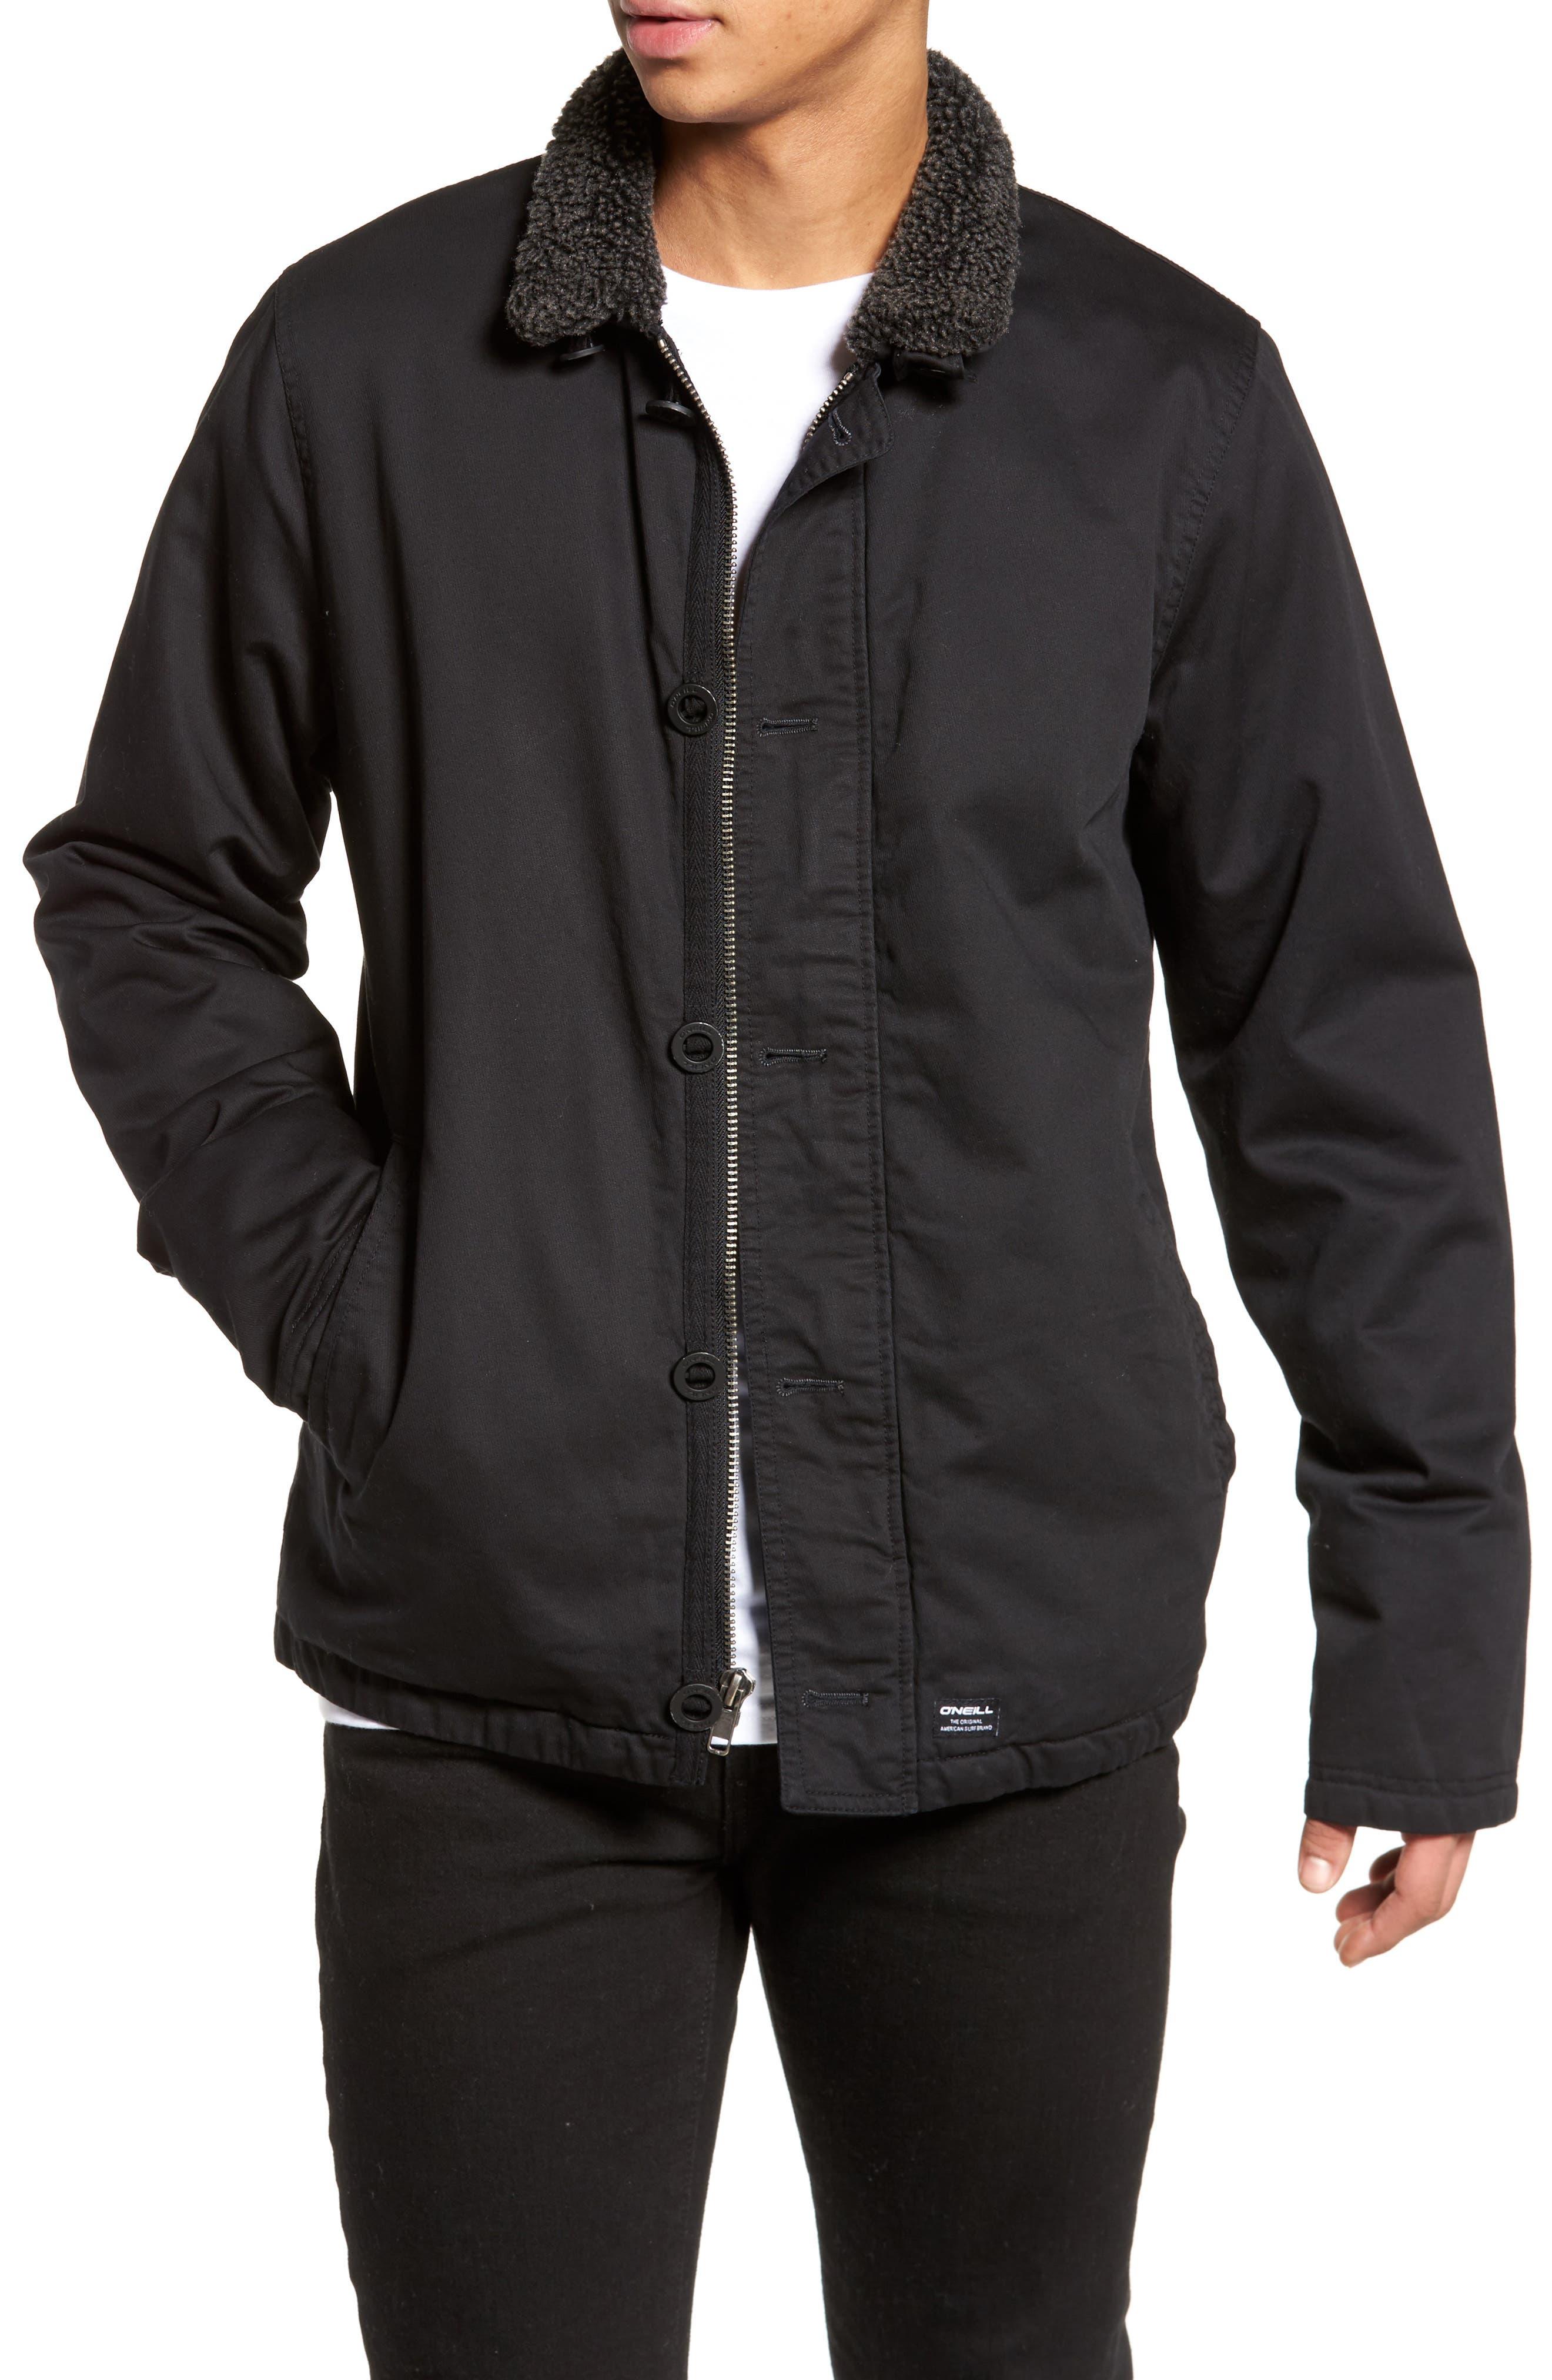 Alternate Image 1 Selected - O'Neill Burnside Faux Shearling Trim Deck Jacket